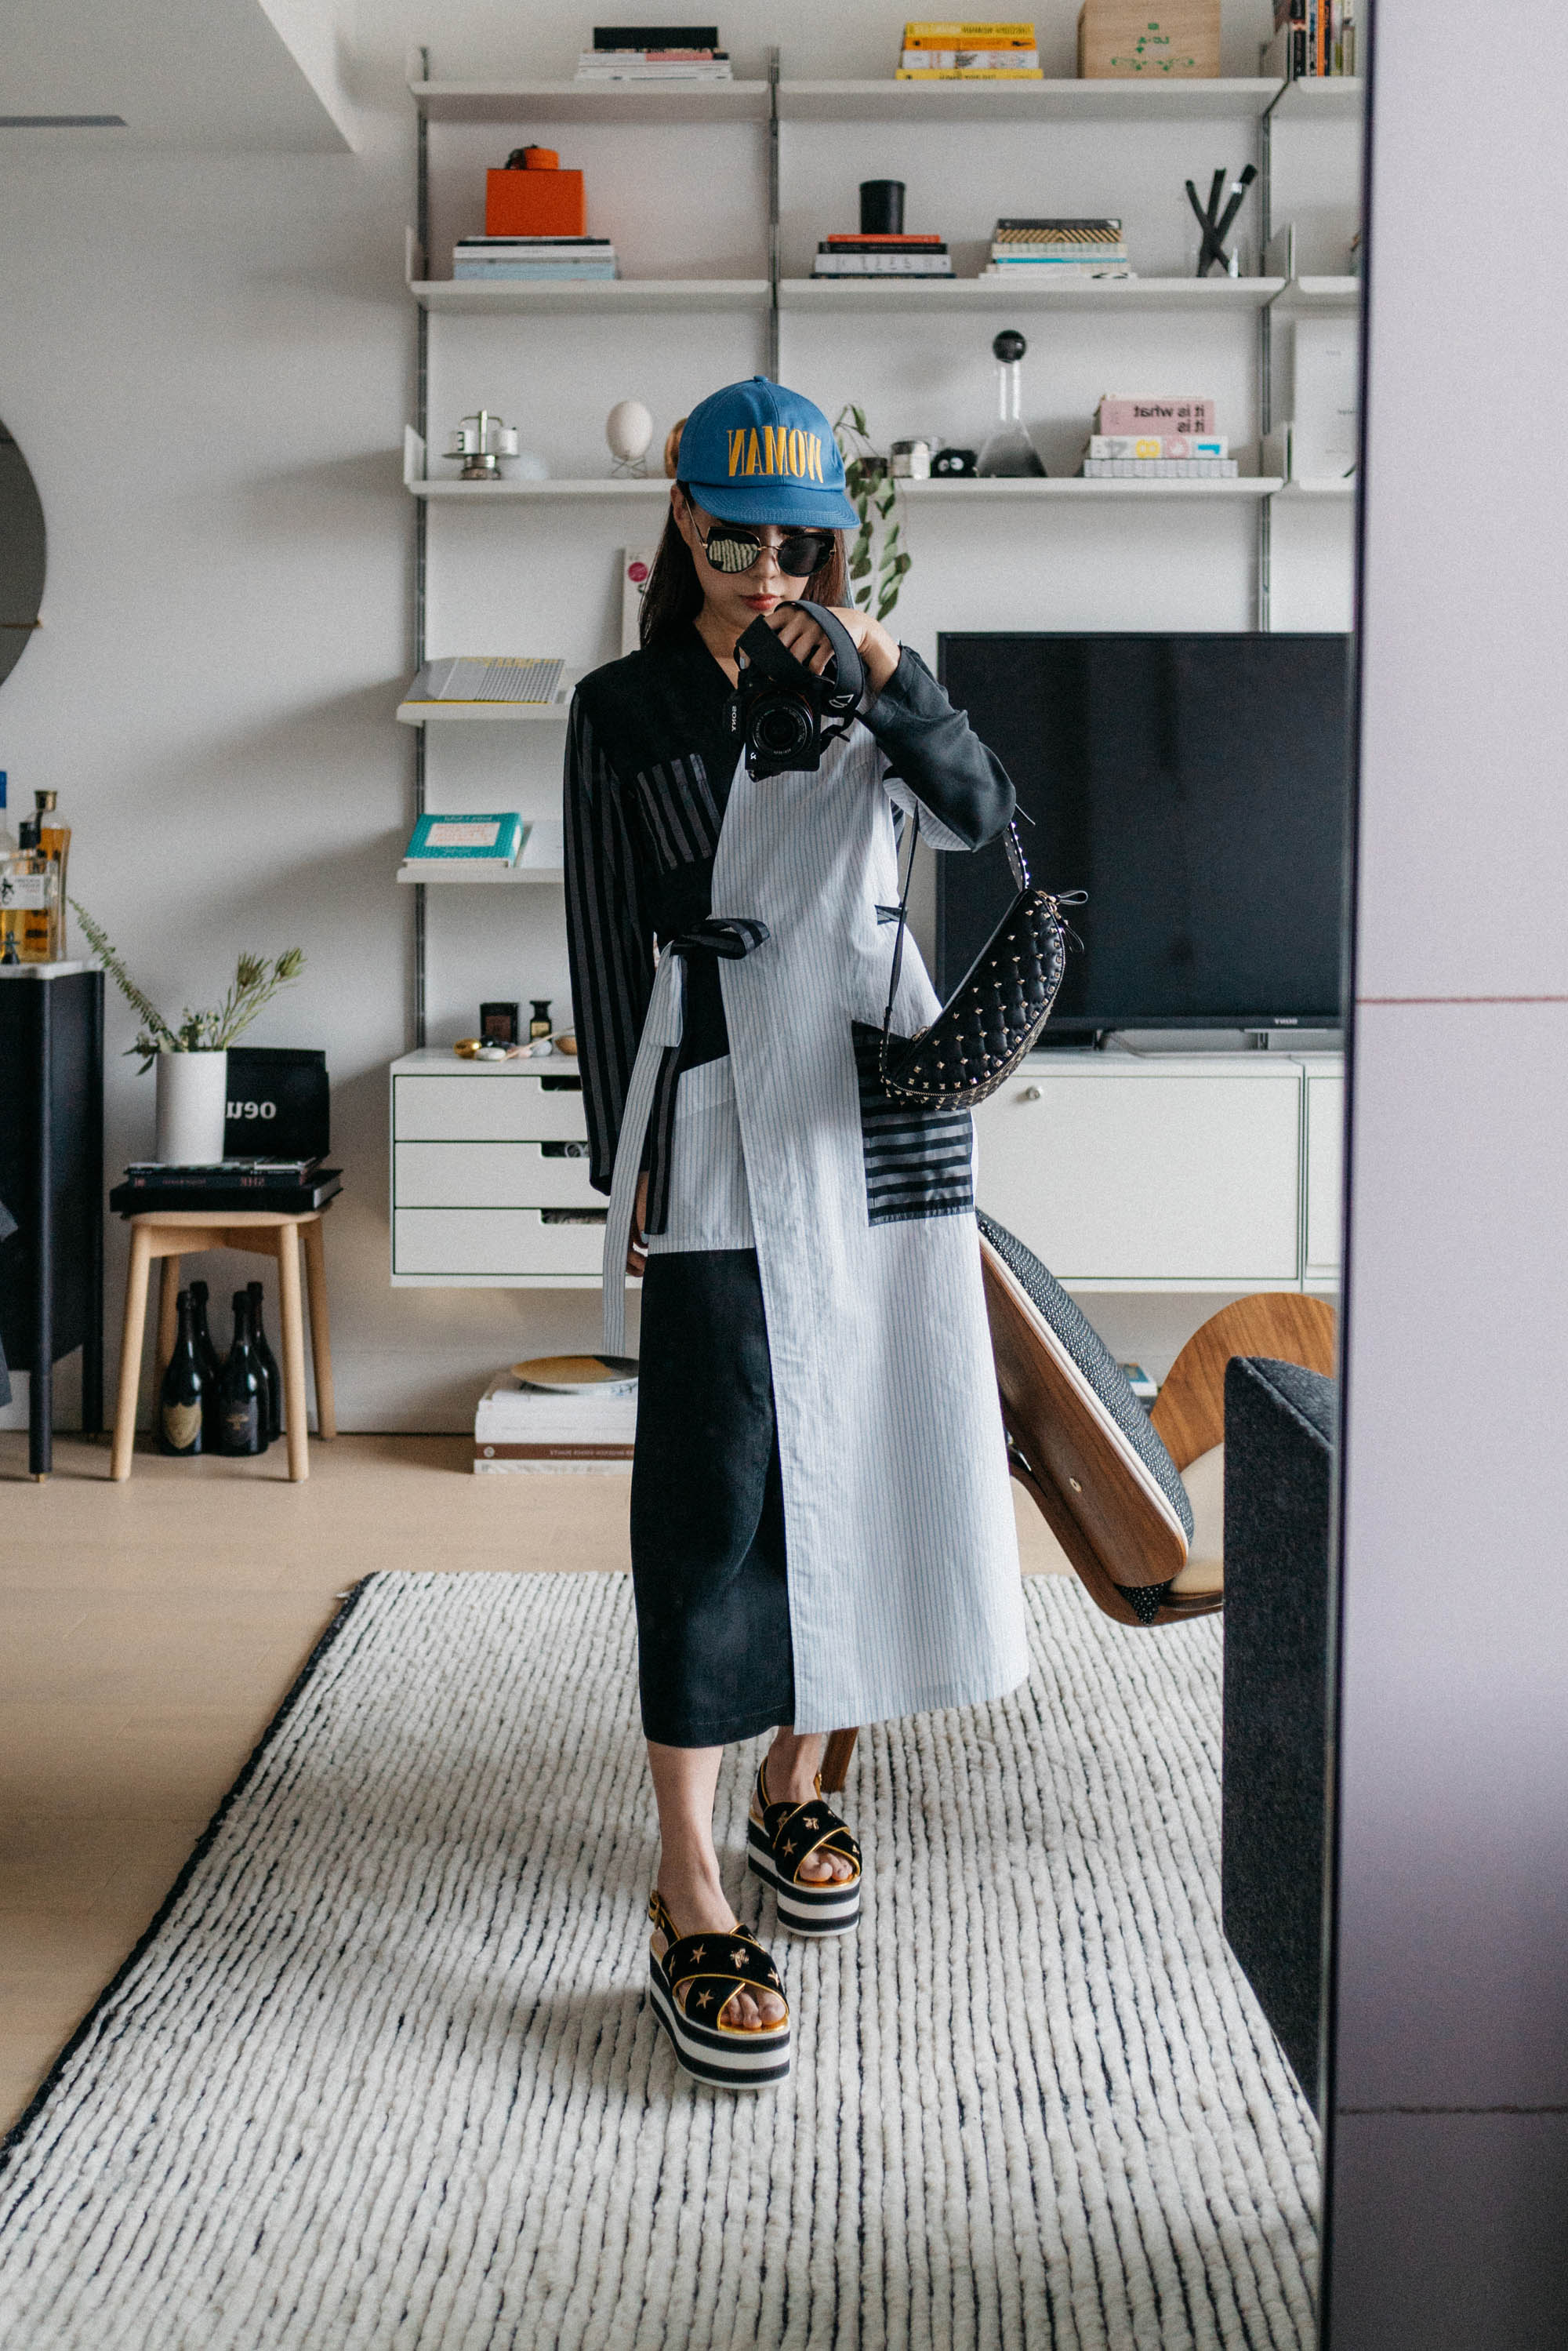 MM6 Maison Margiela Jacket,  Gucci Sandals , Valentino Bag, Gentle Monster Sunglasses,  Off-White Hat